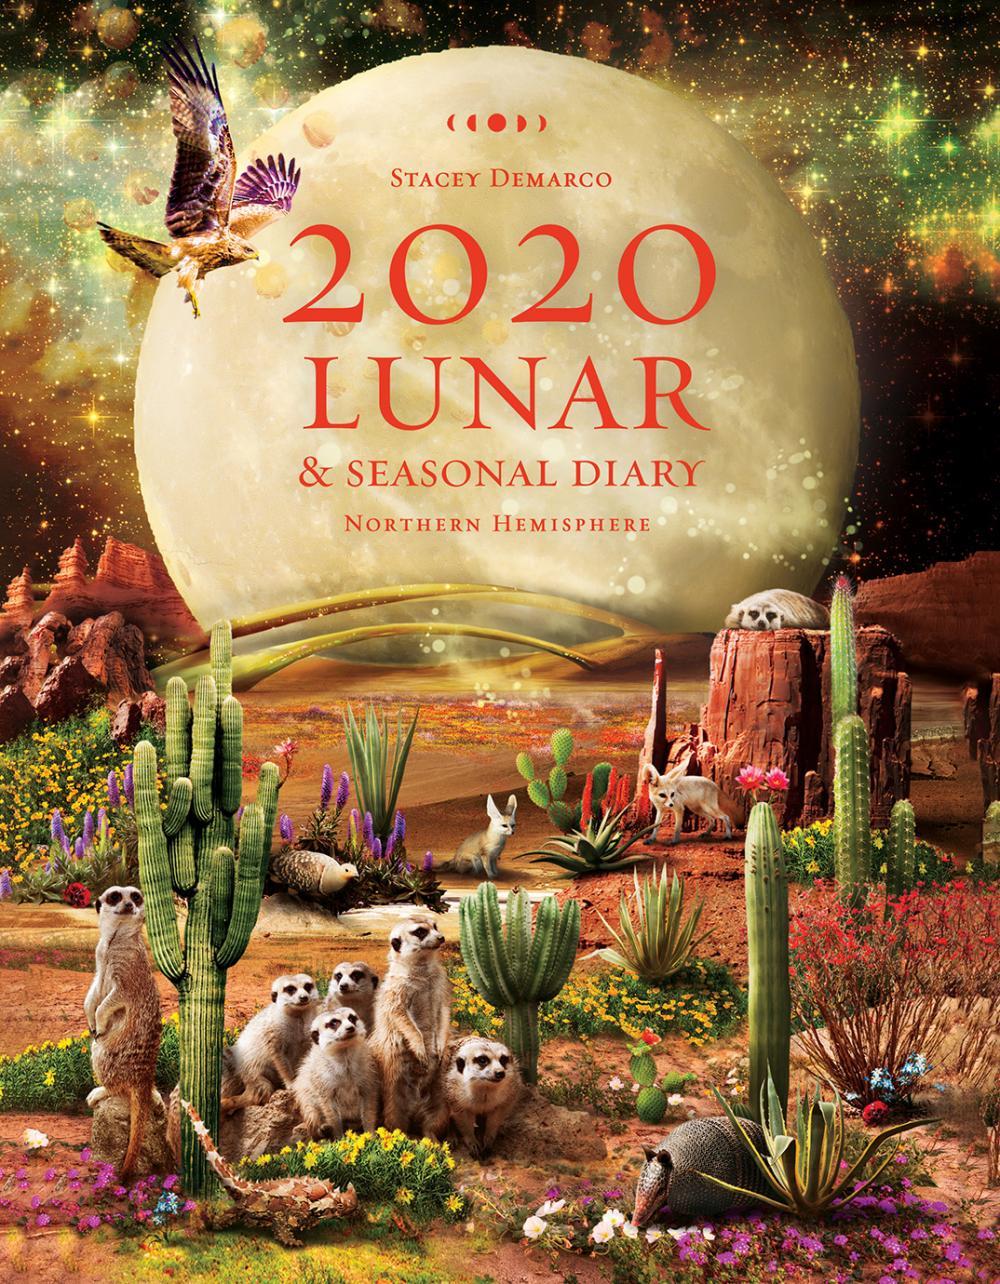 2020 Lunar Diary - Northern Hemisphere